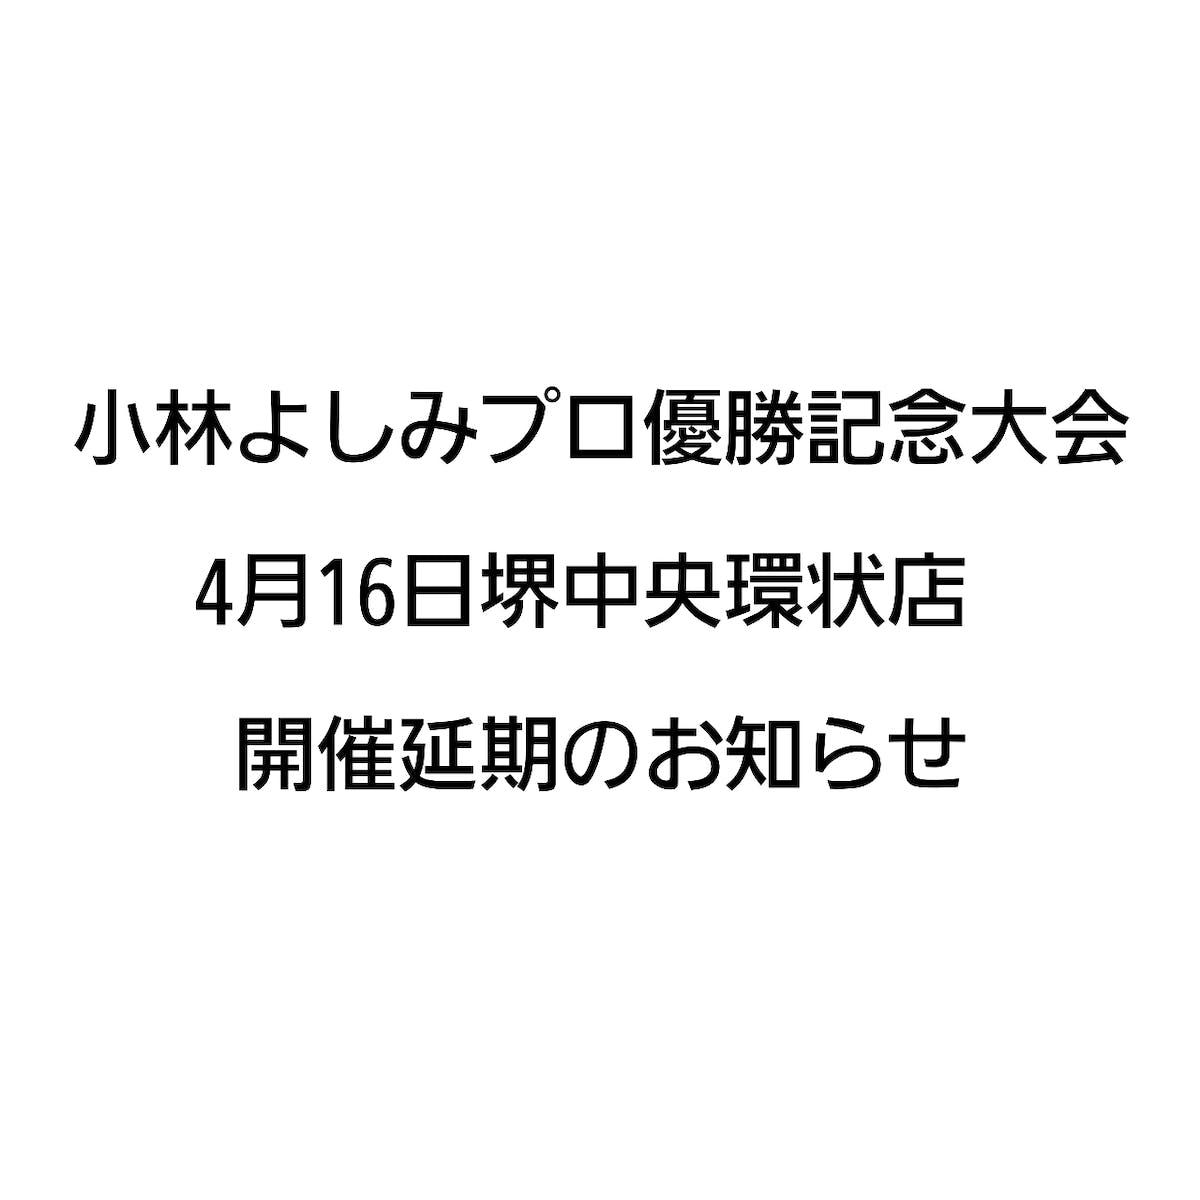 21-04-06-19-11-23-901_deco.jpg